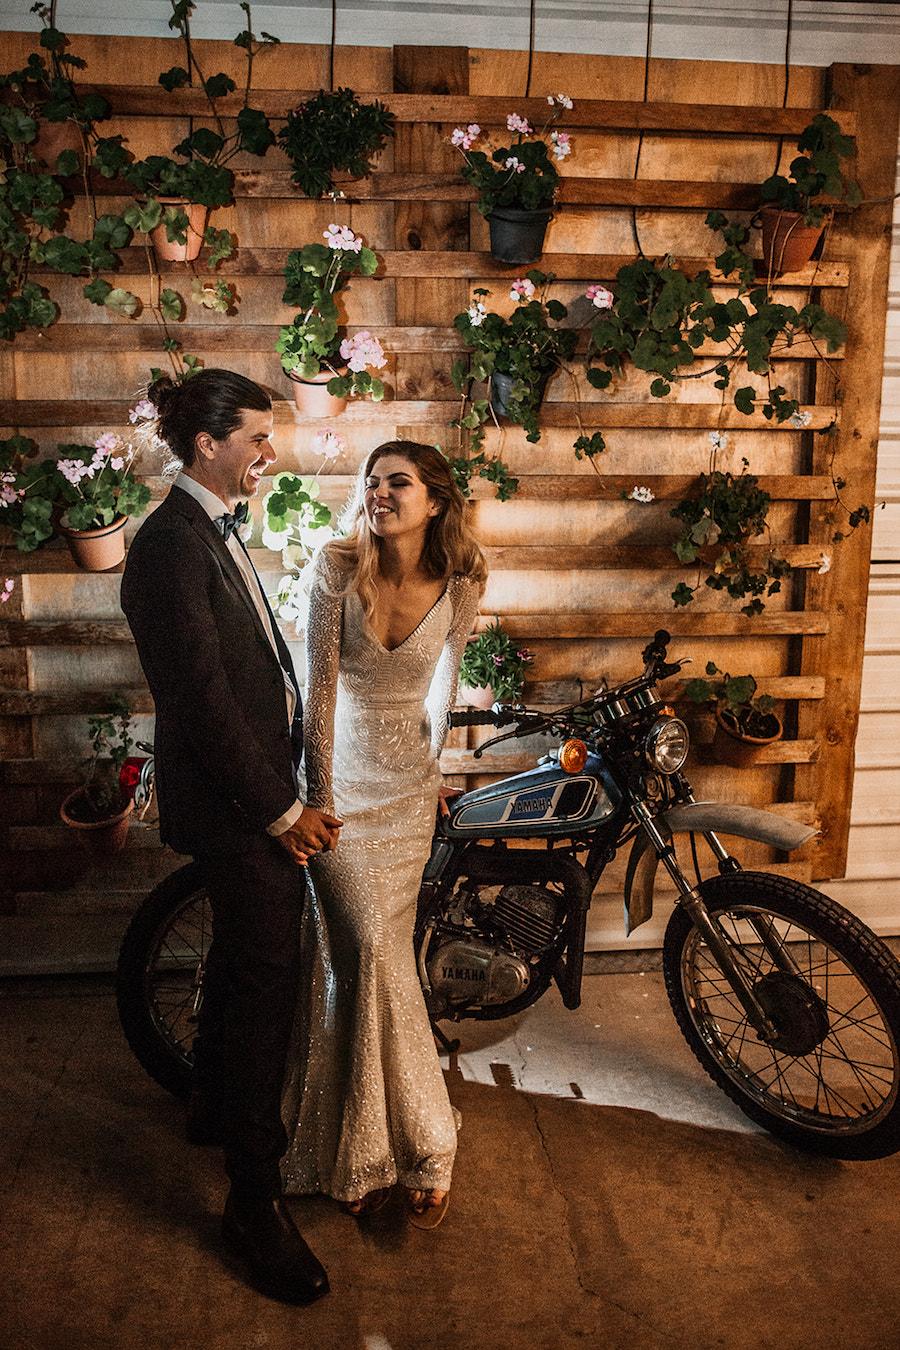 tweed-coast-weddings-wedding-venue-osteria-kelly-rohan-cloud-catcher-photography-Web_RK798.jpg